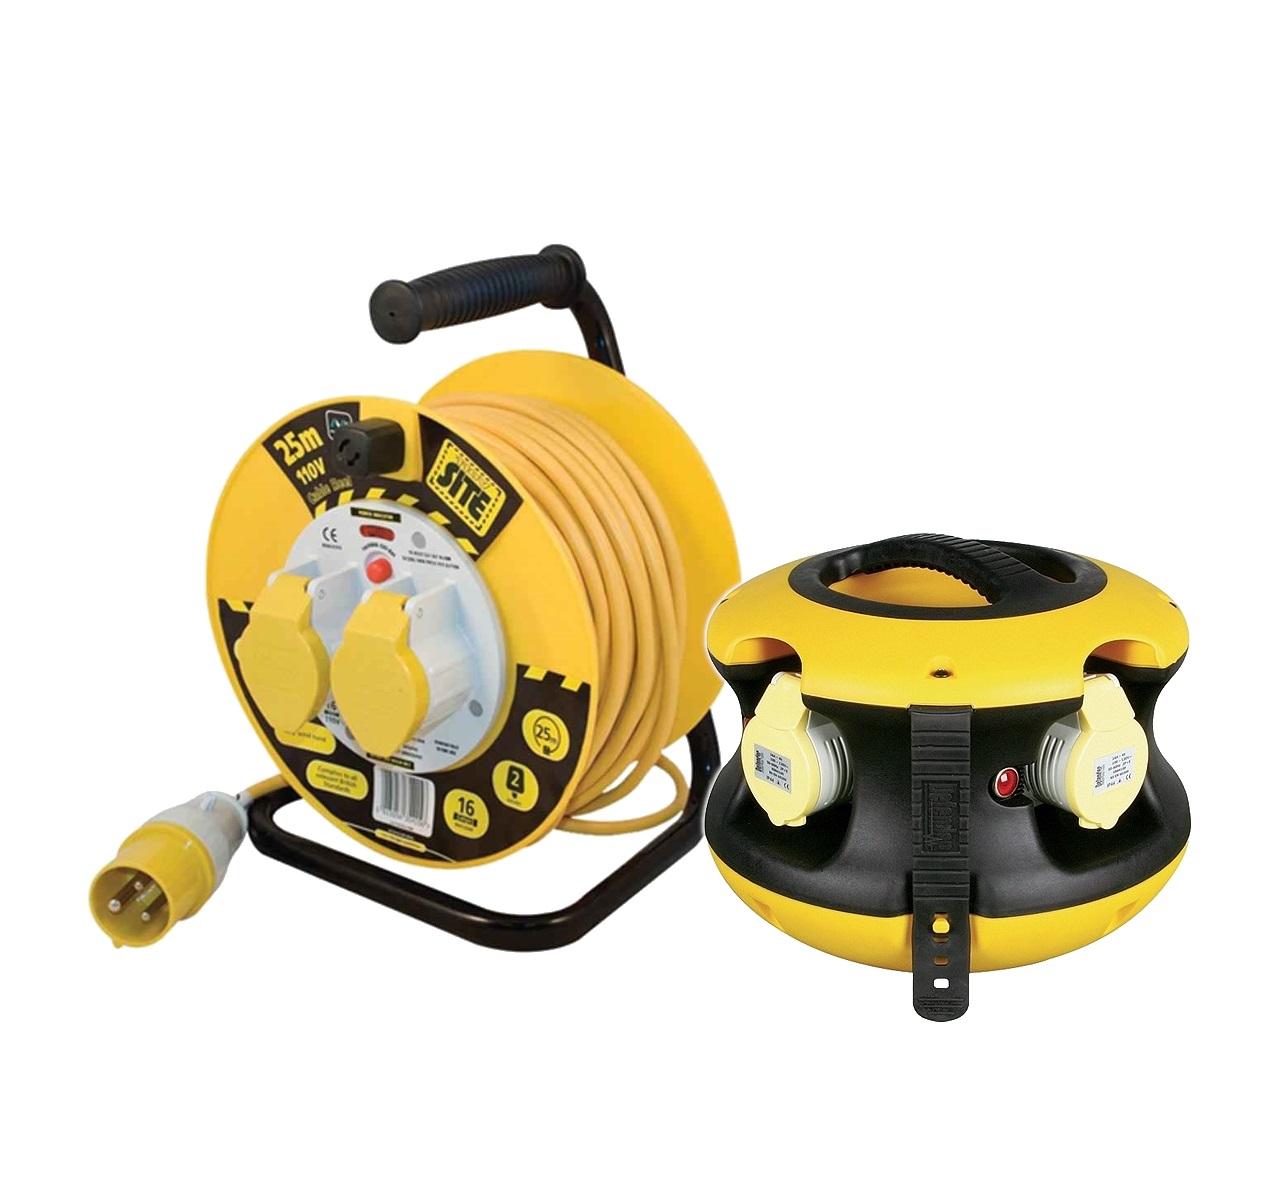 110v Cable Reels & Splitters